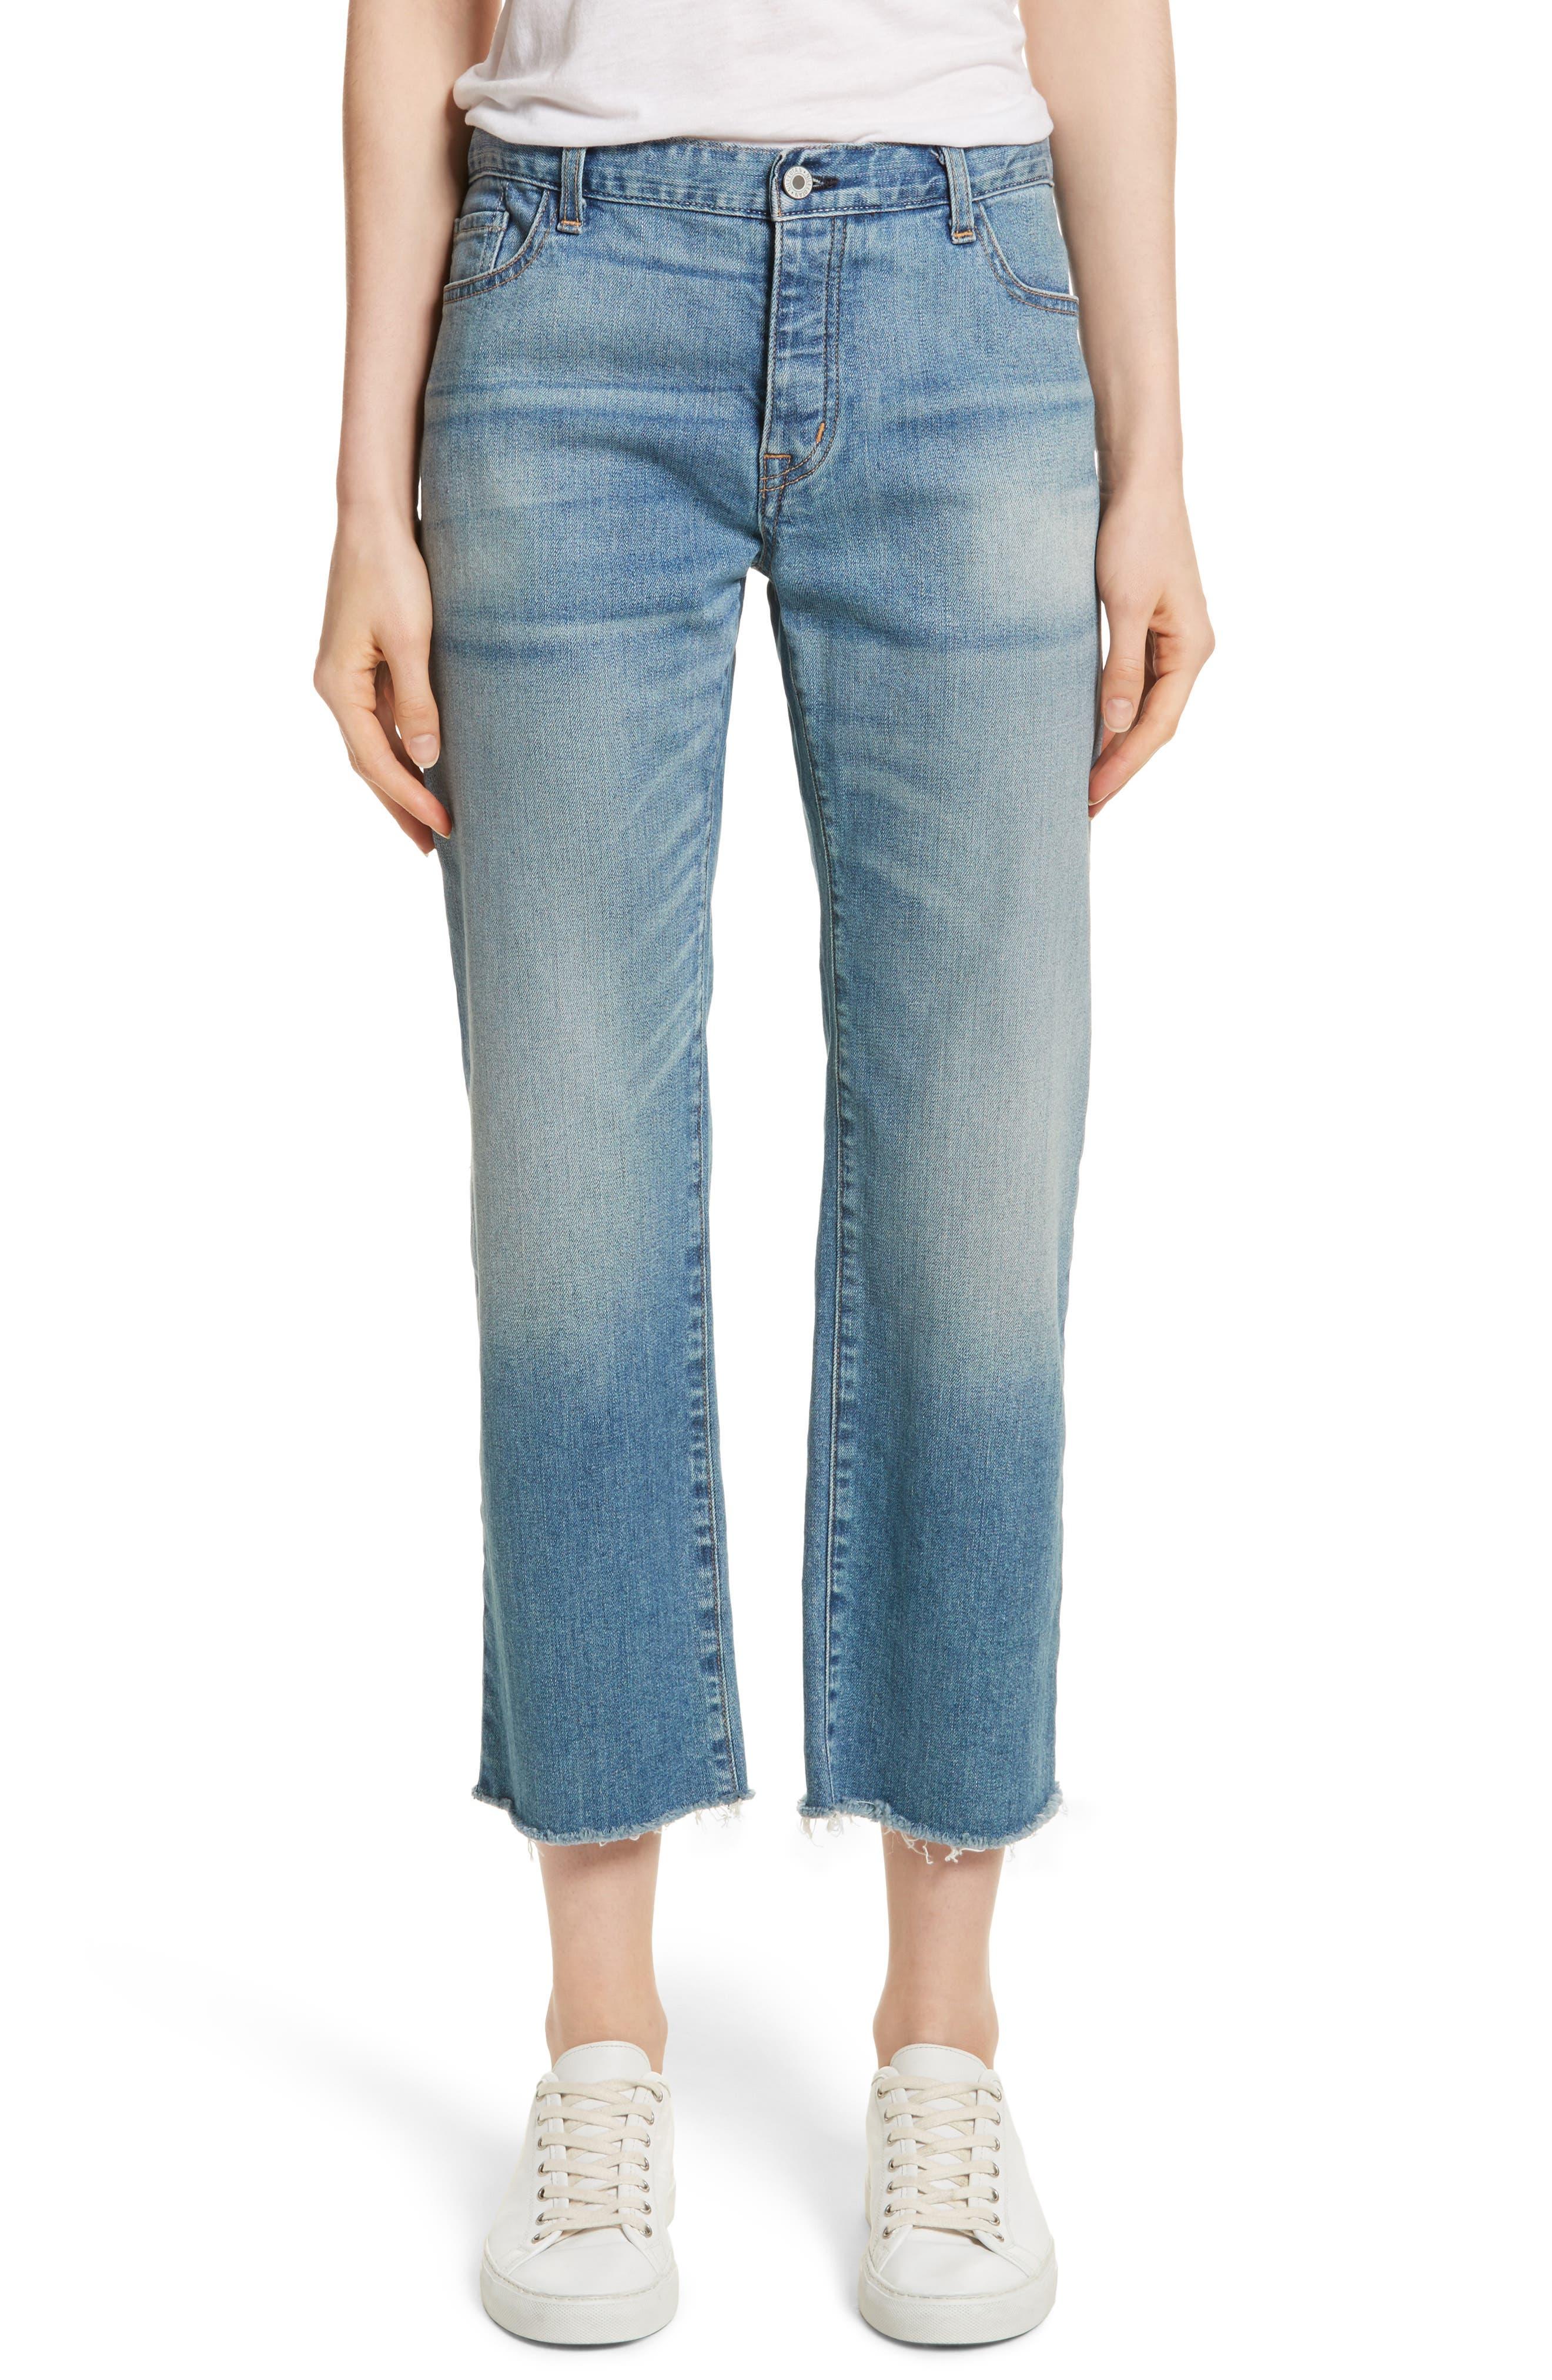 NILI LOTAN,                             Raw Edge Crop Boyfriend Jeans,                             Main thumbnail 1, color,                             VENICE WASH